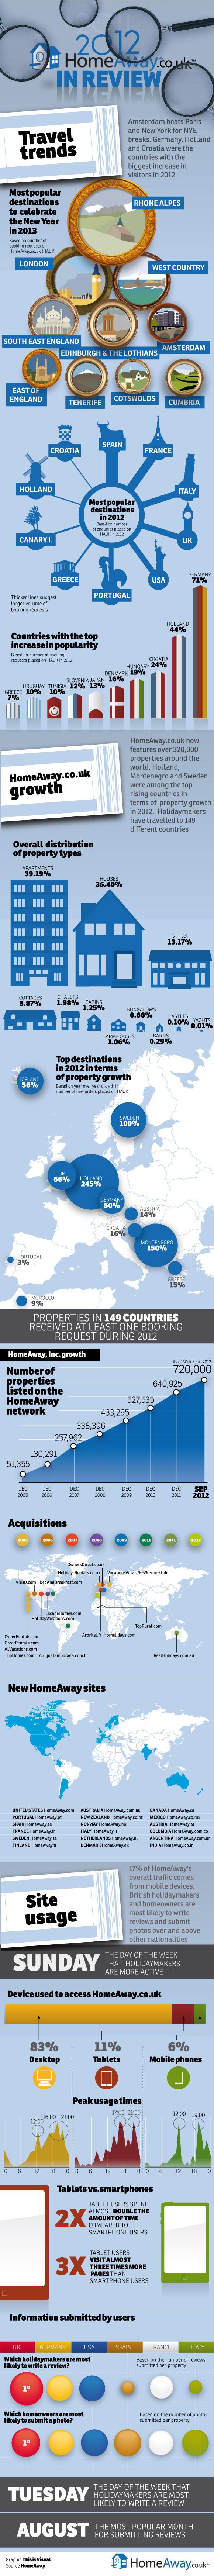 1homeaway-travel-trends-2012